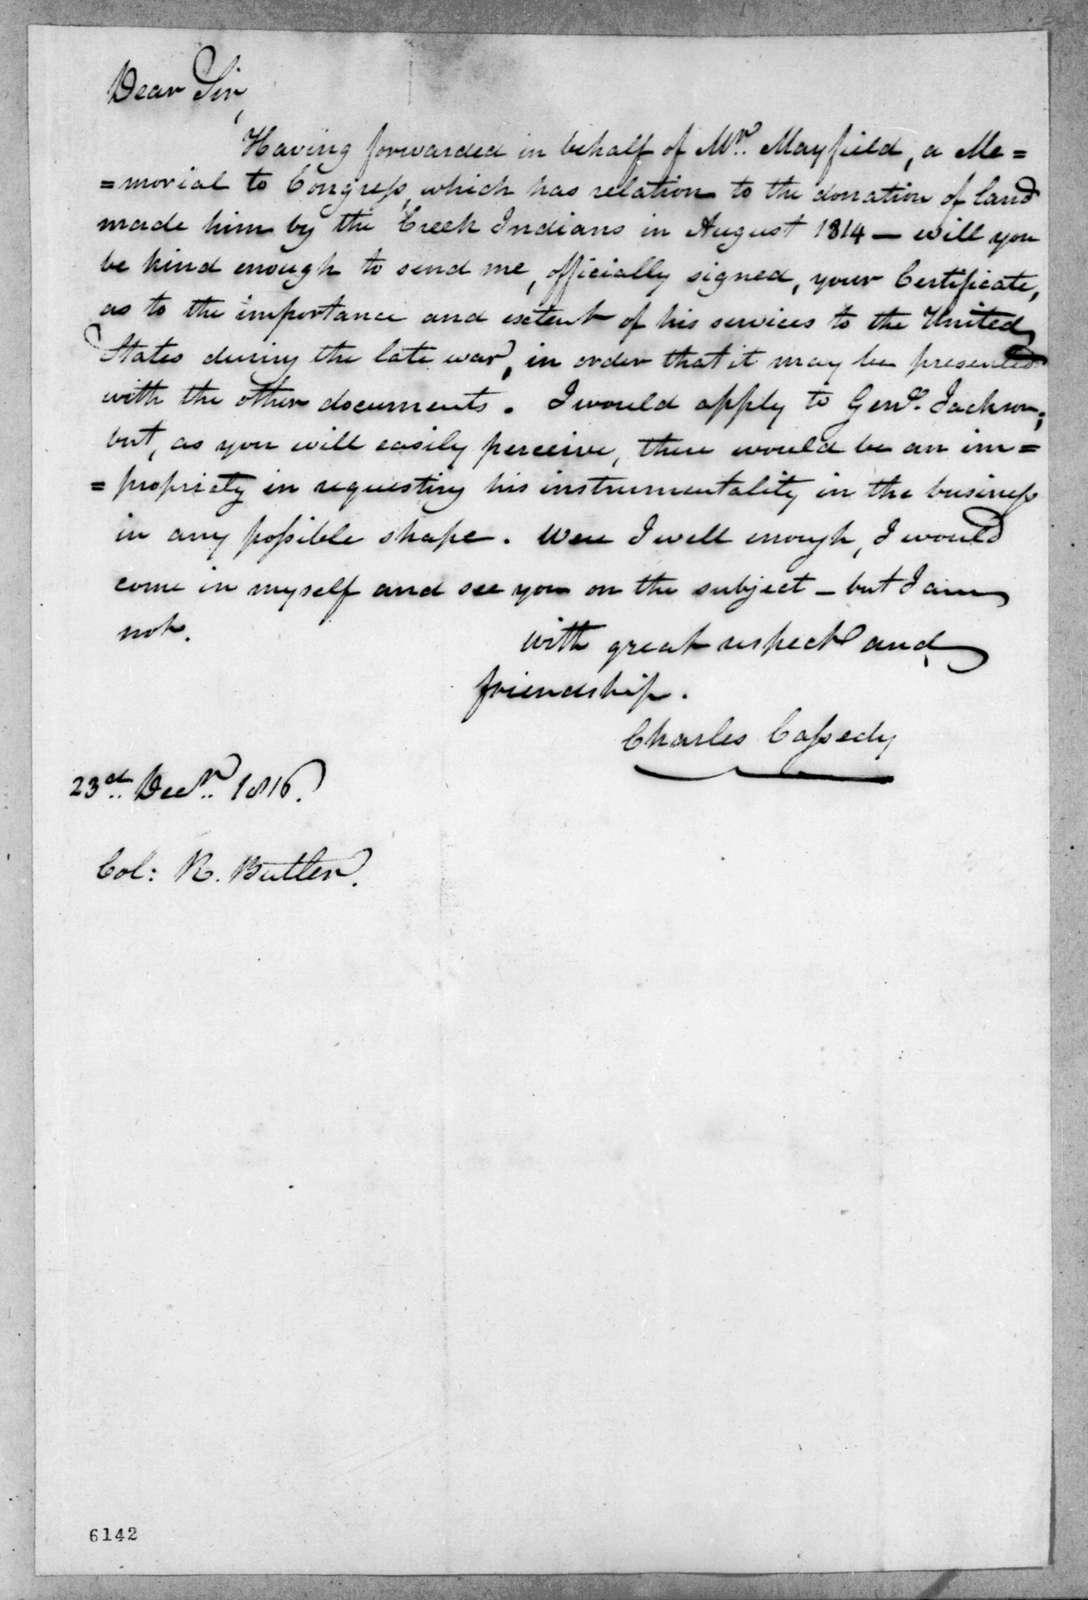 Charles Cassedy to Robert Butler, December 23, 1816